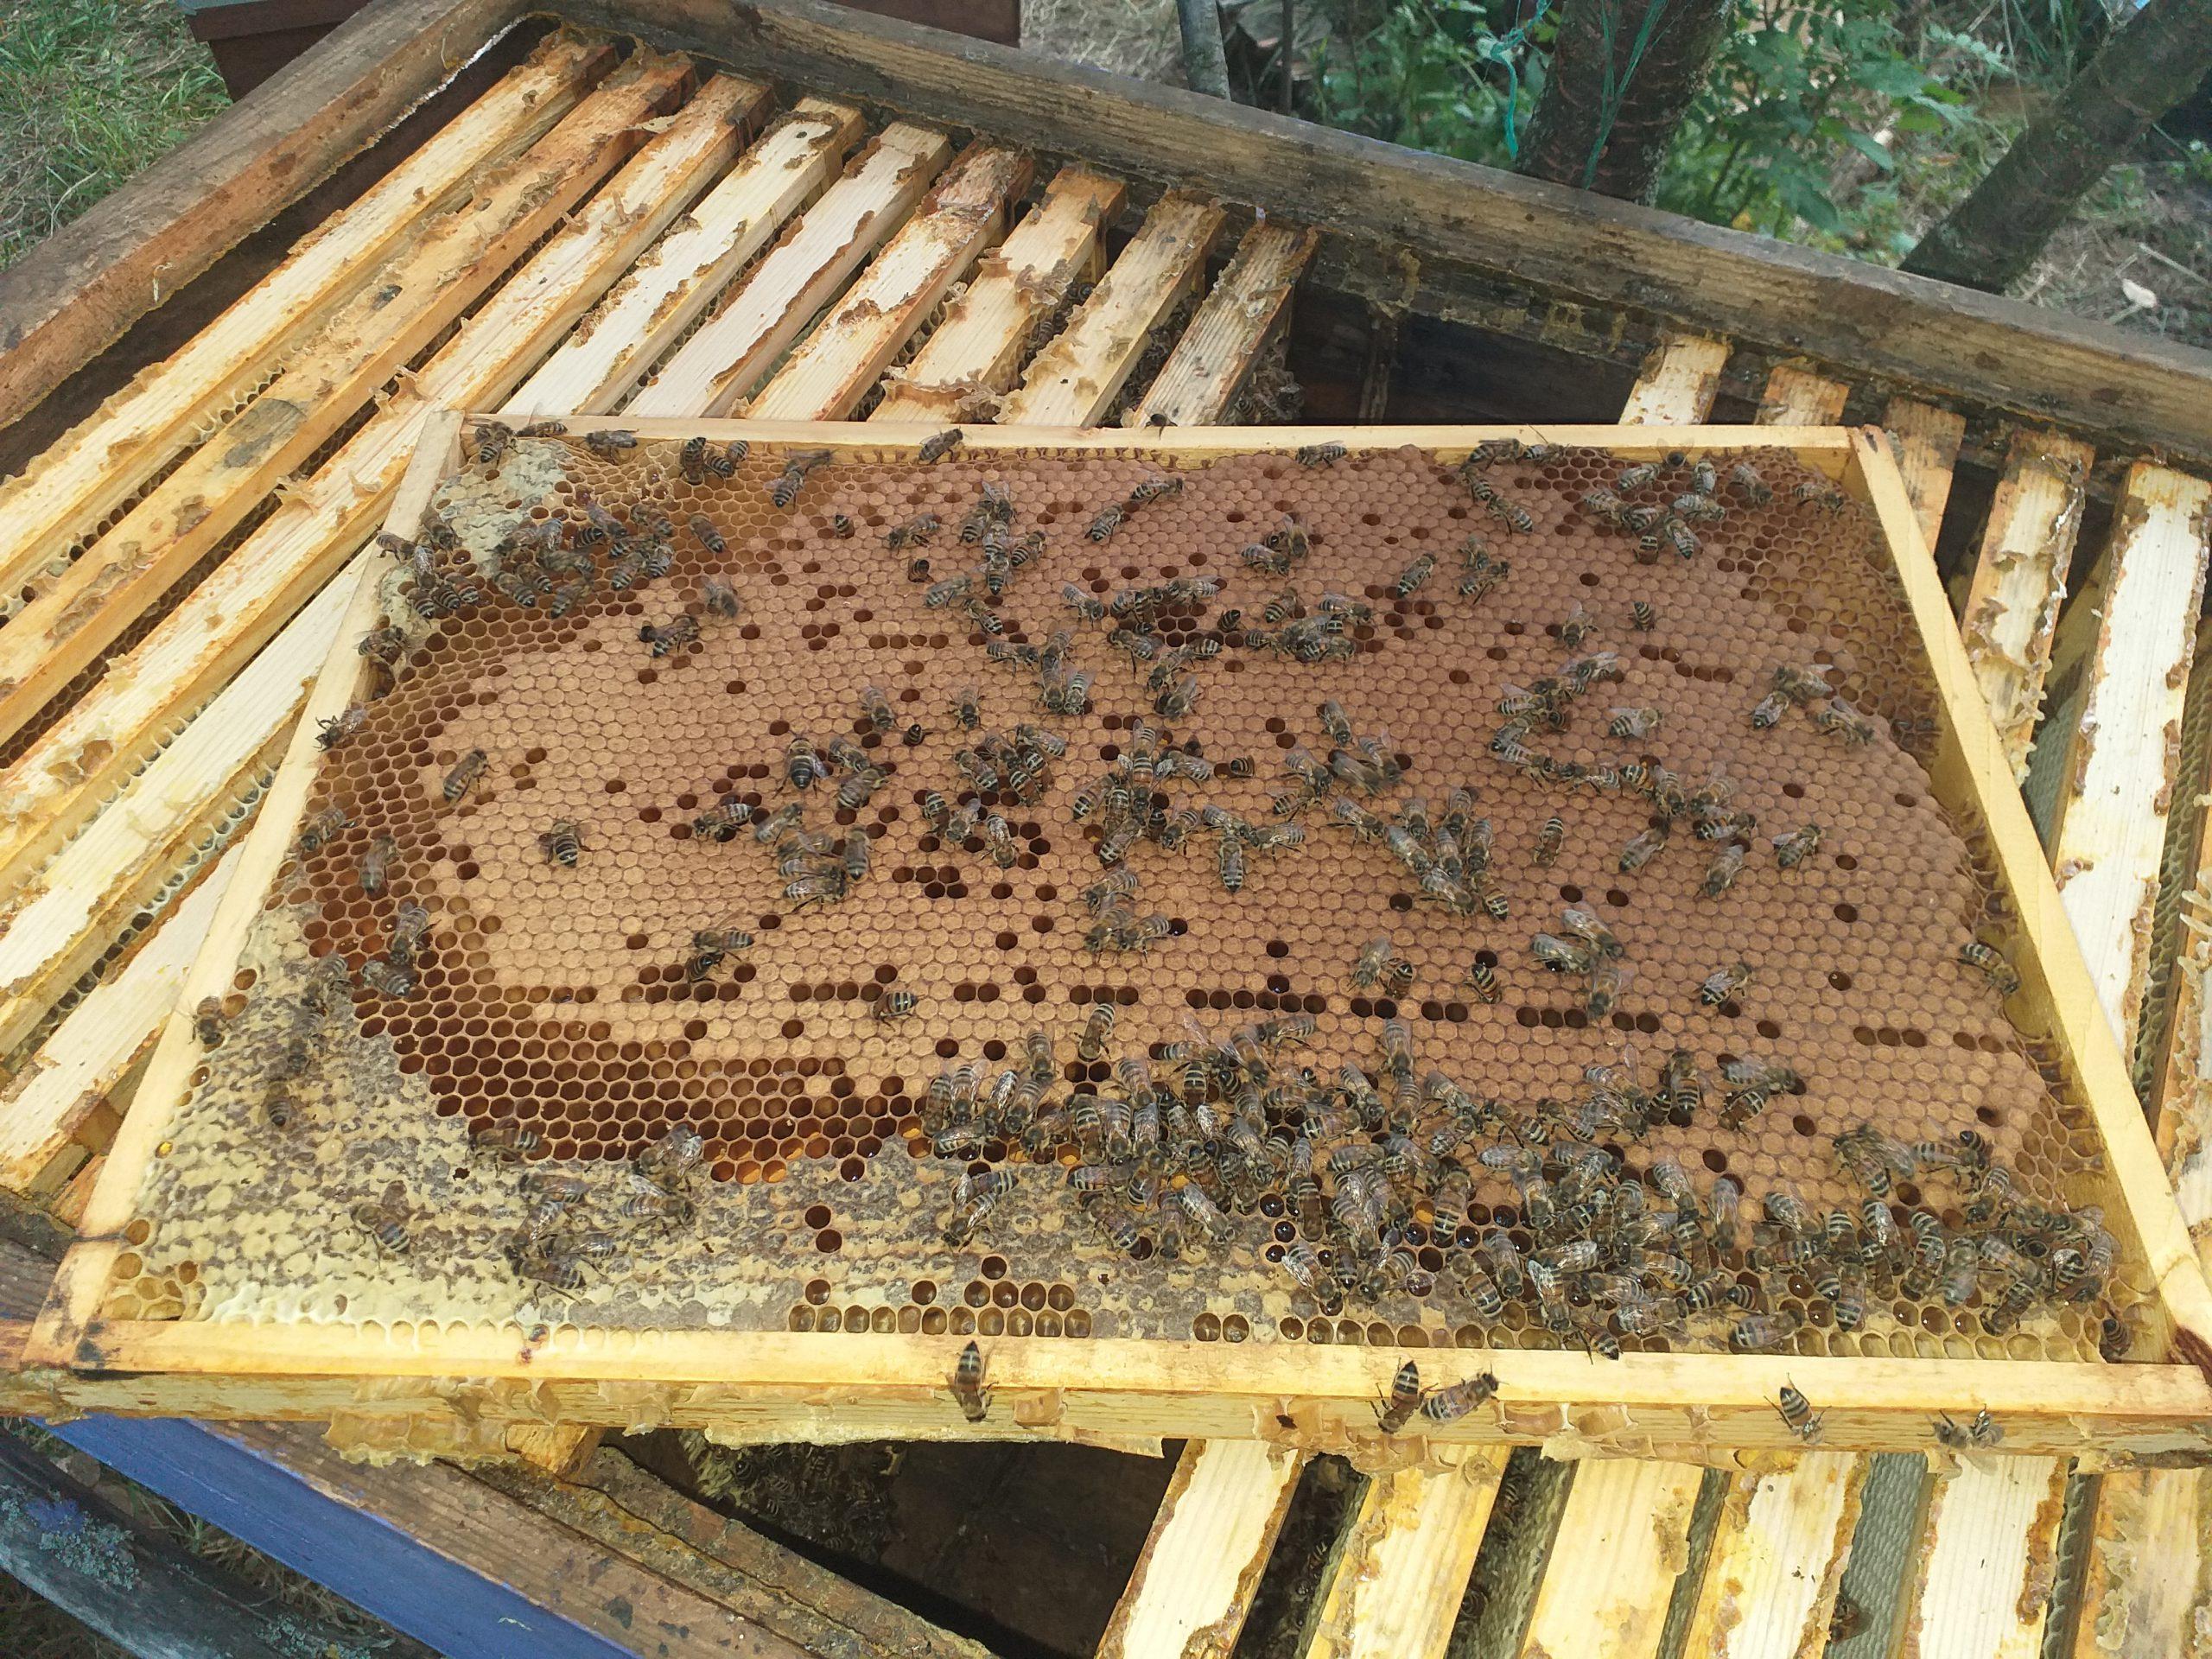 Бджолопакети купити Київ Кагарлик